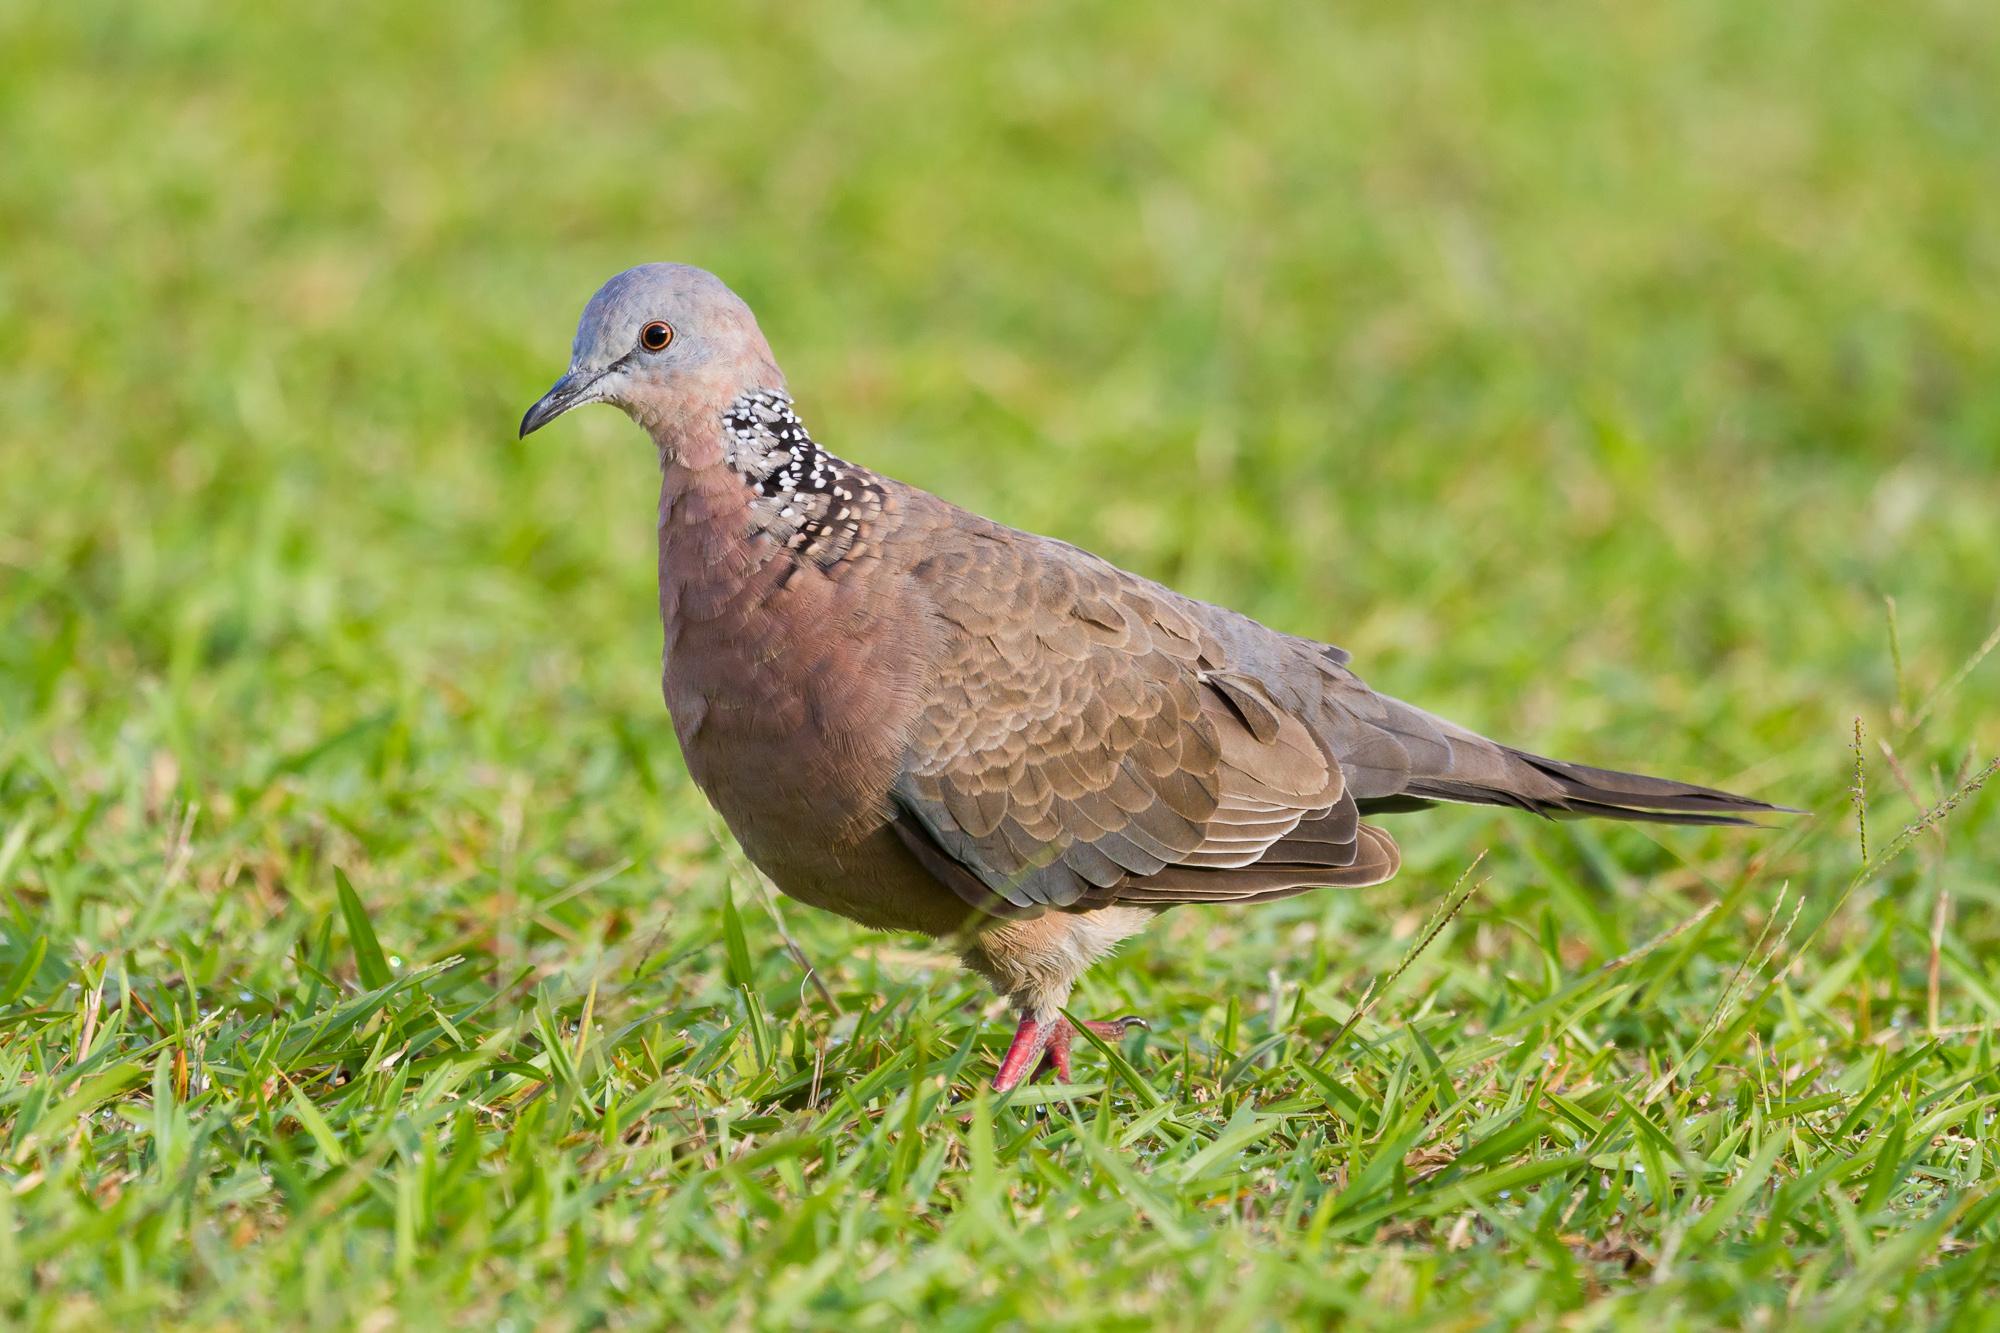 Rose Bowl Parade: Liberar a las palomas en peligro? - Noticias de Mercurio